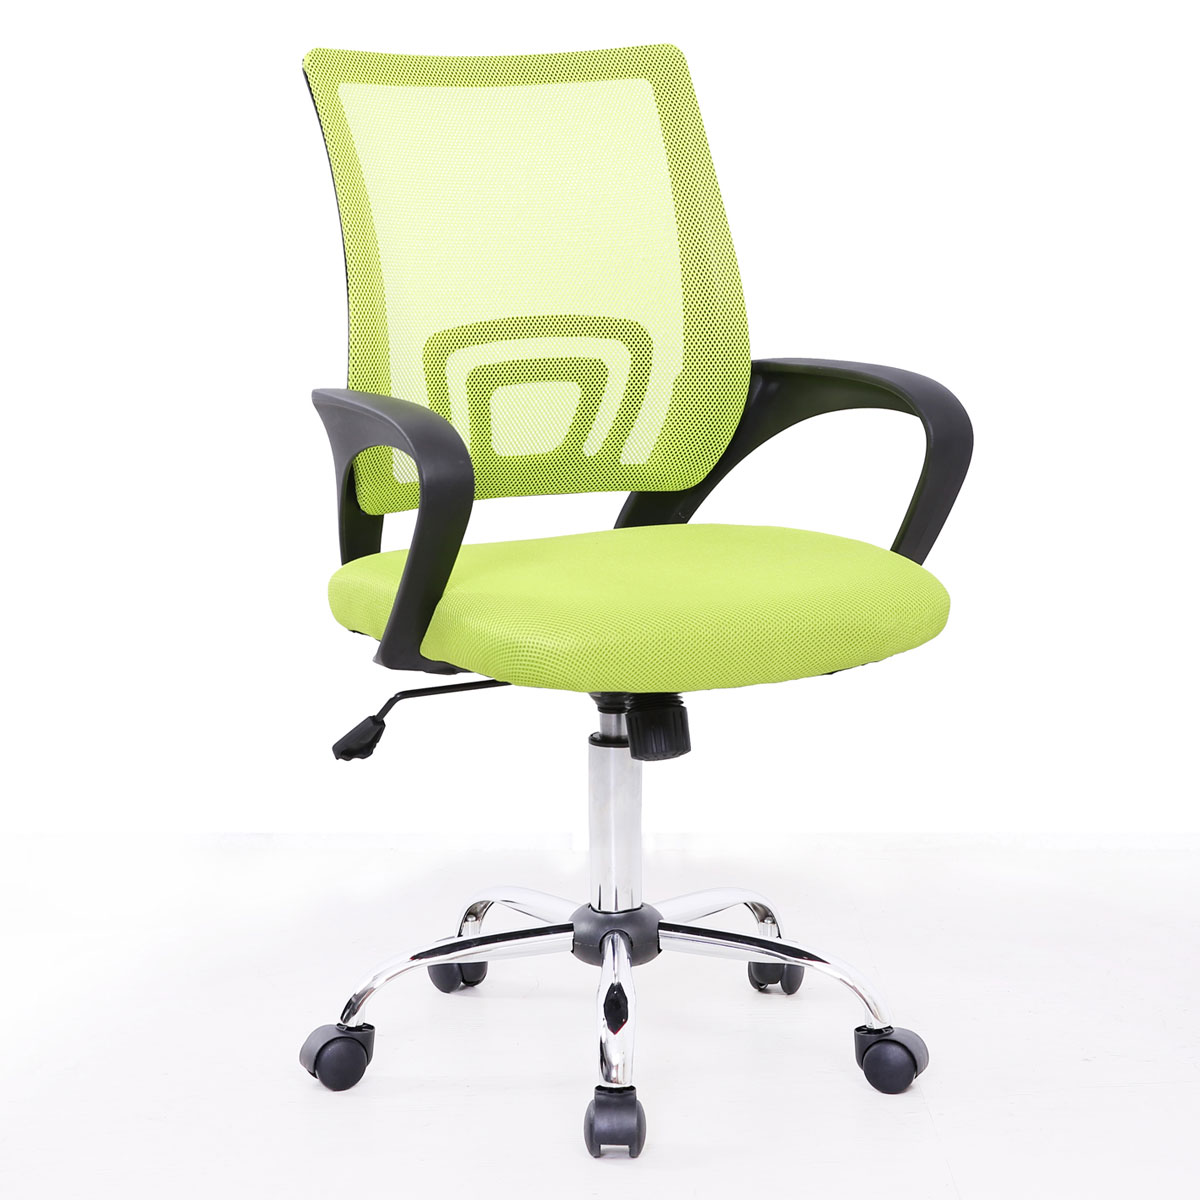 91200 SVITA CYDNEY Kinder Schreibtischstuhl Netzbezug grün